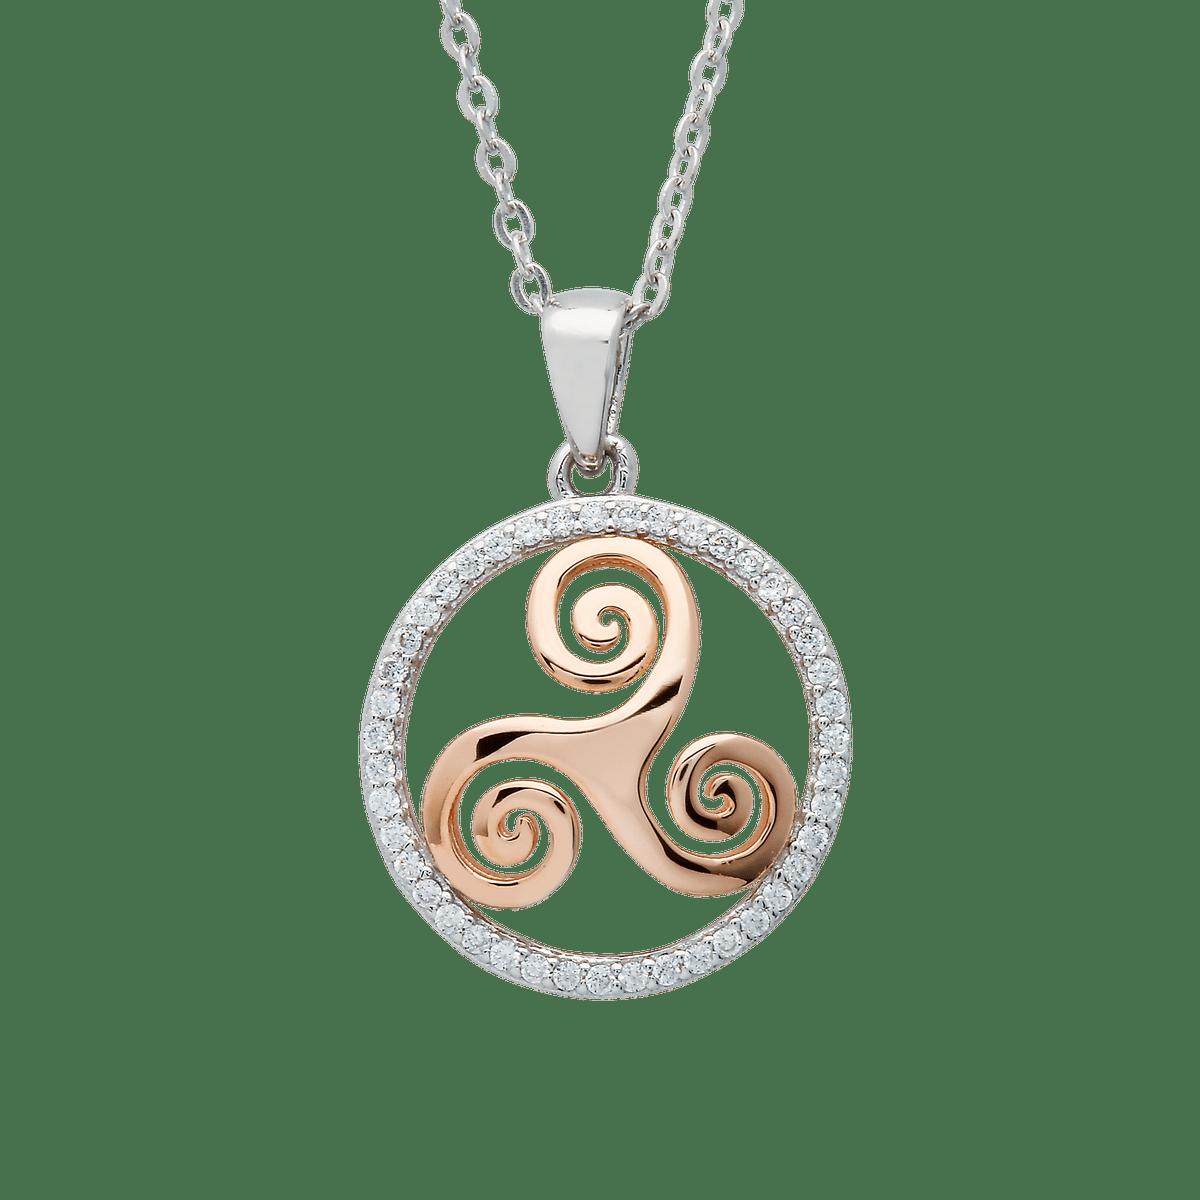 Silver Cz Newgrange Spiral Pendant